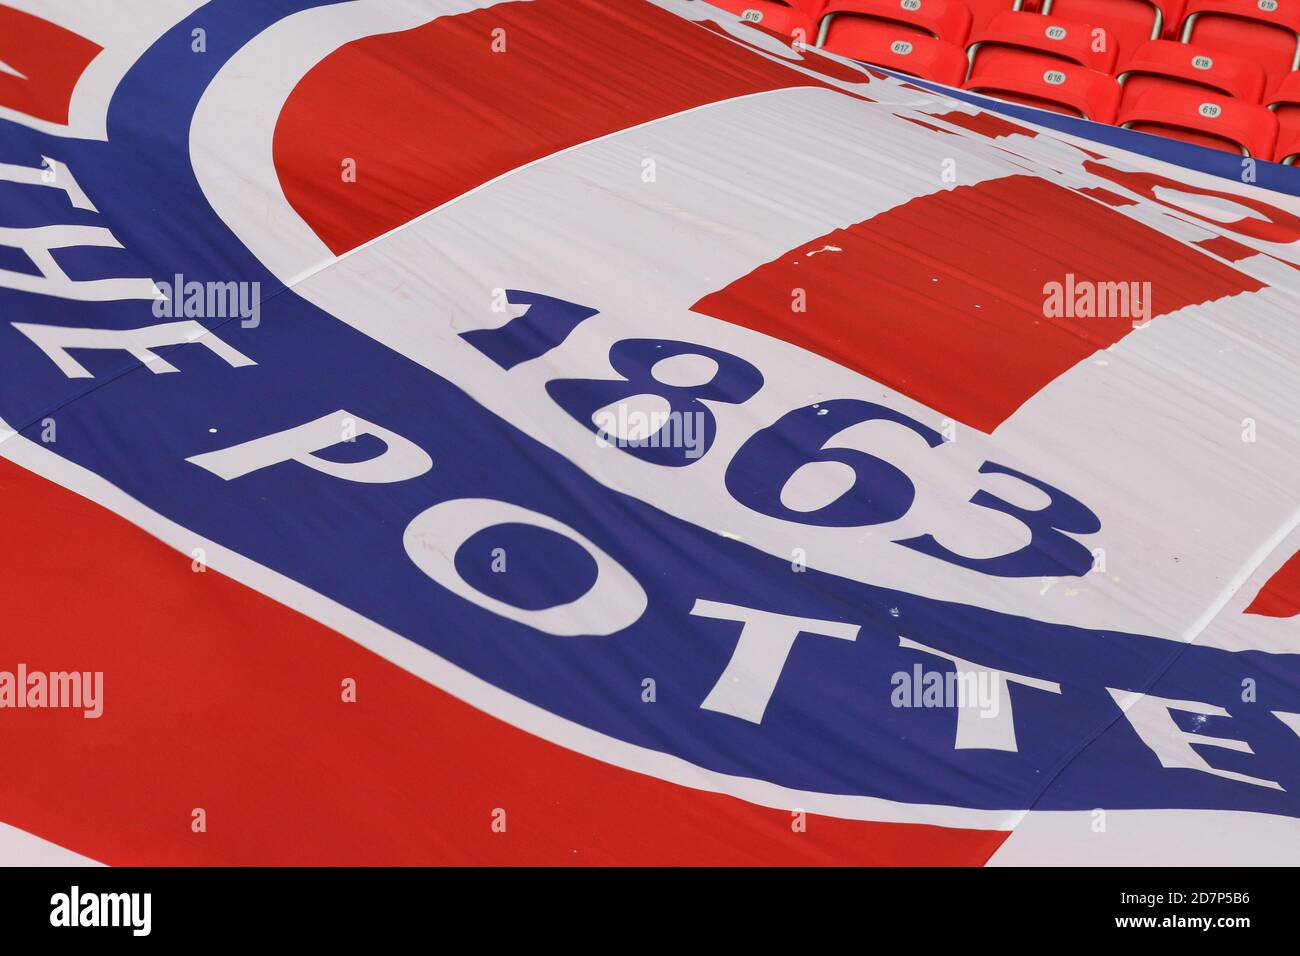 Partaj live betting bet sports betting baseball postponed